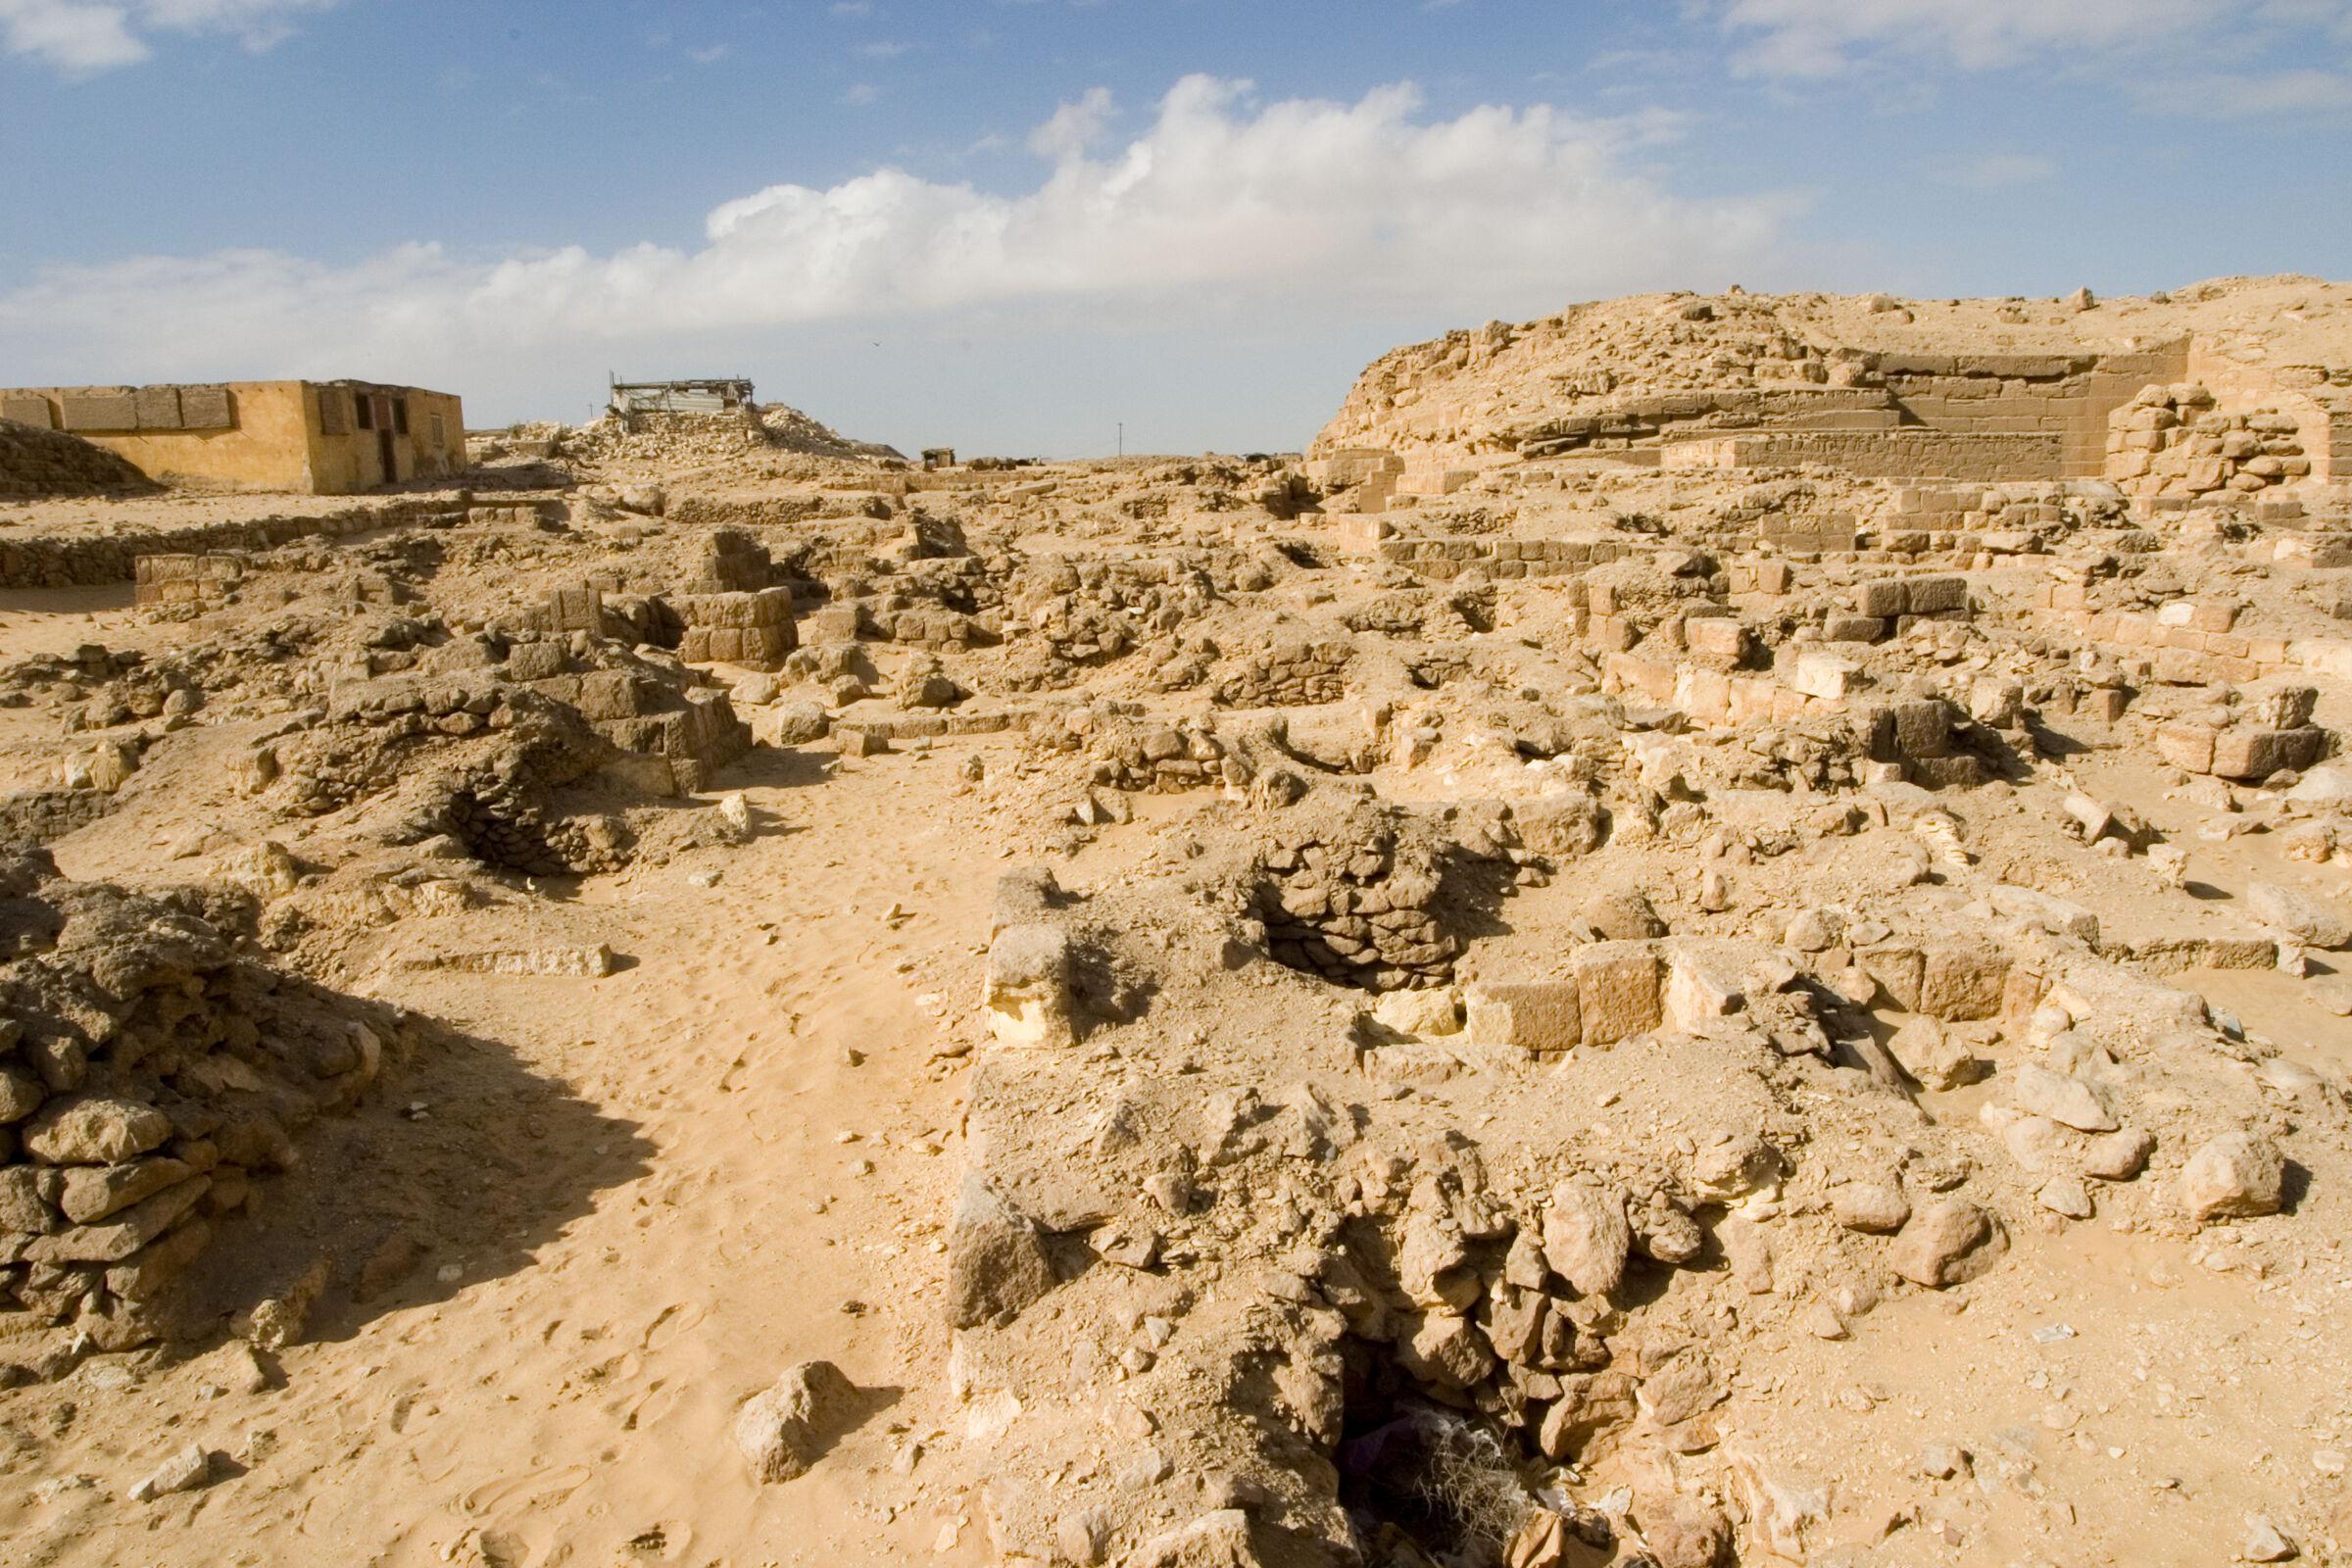 Western Cemetery: Site: Giza; View: G 2009, G 2010, G 2011, G 2012, G 2013, G 2014, G 2015, G 2000